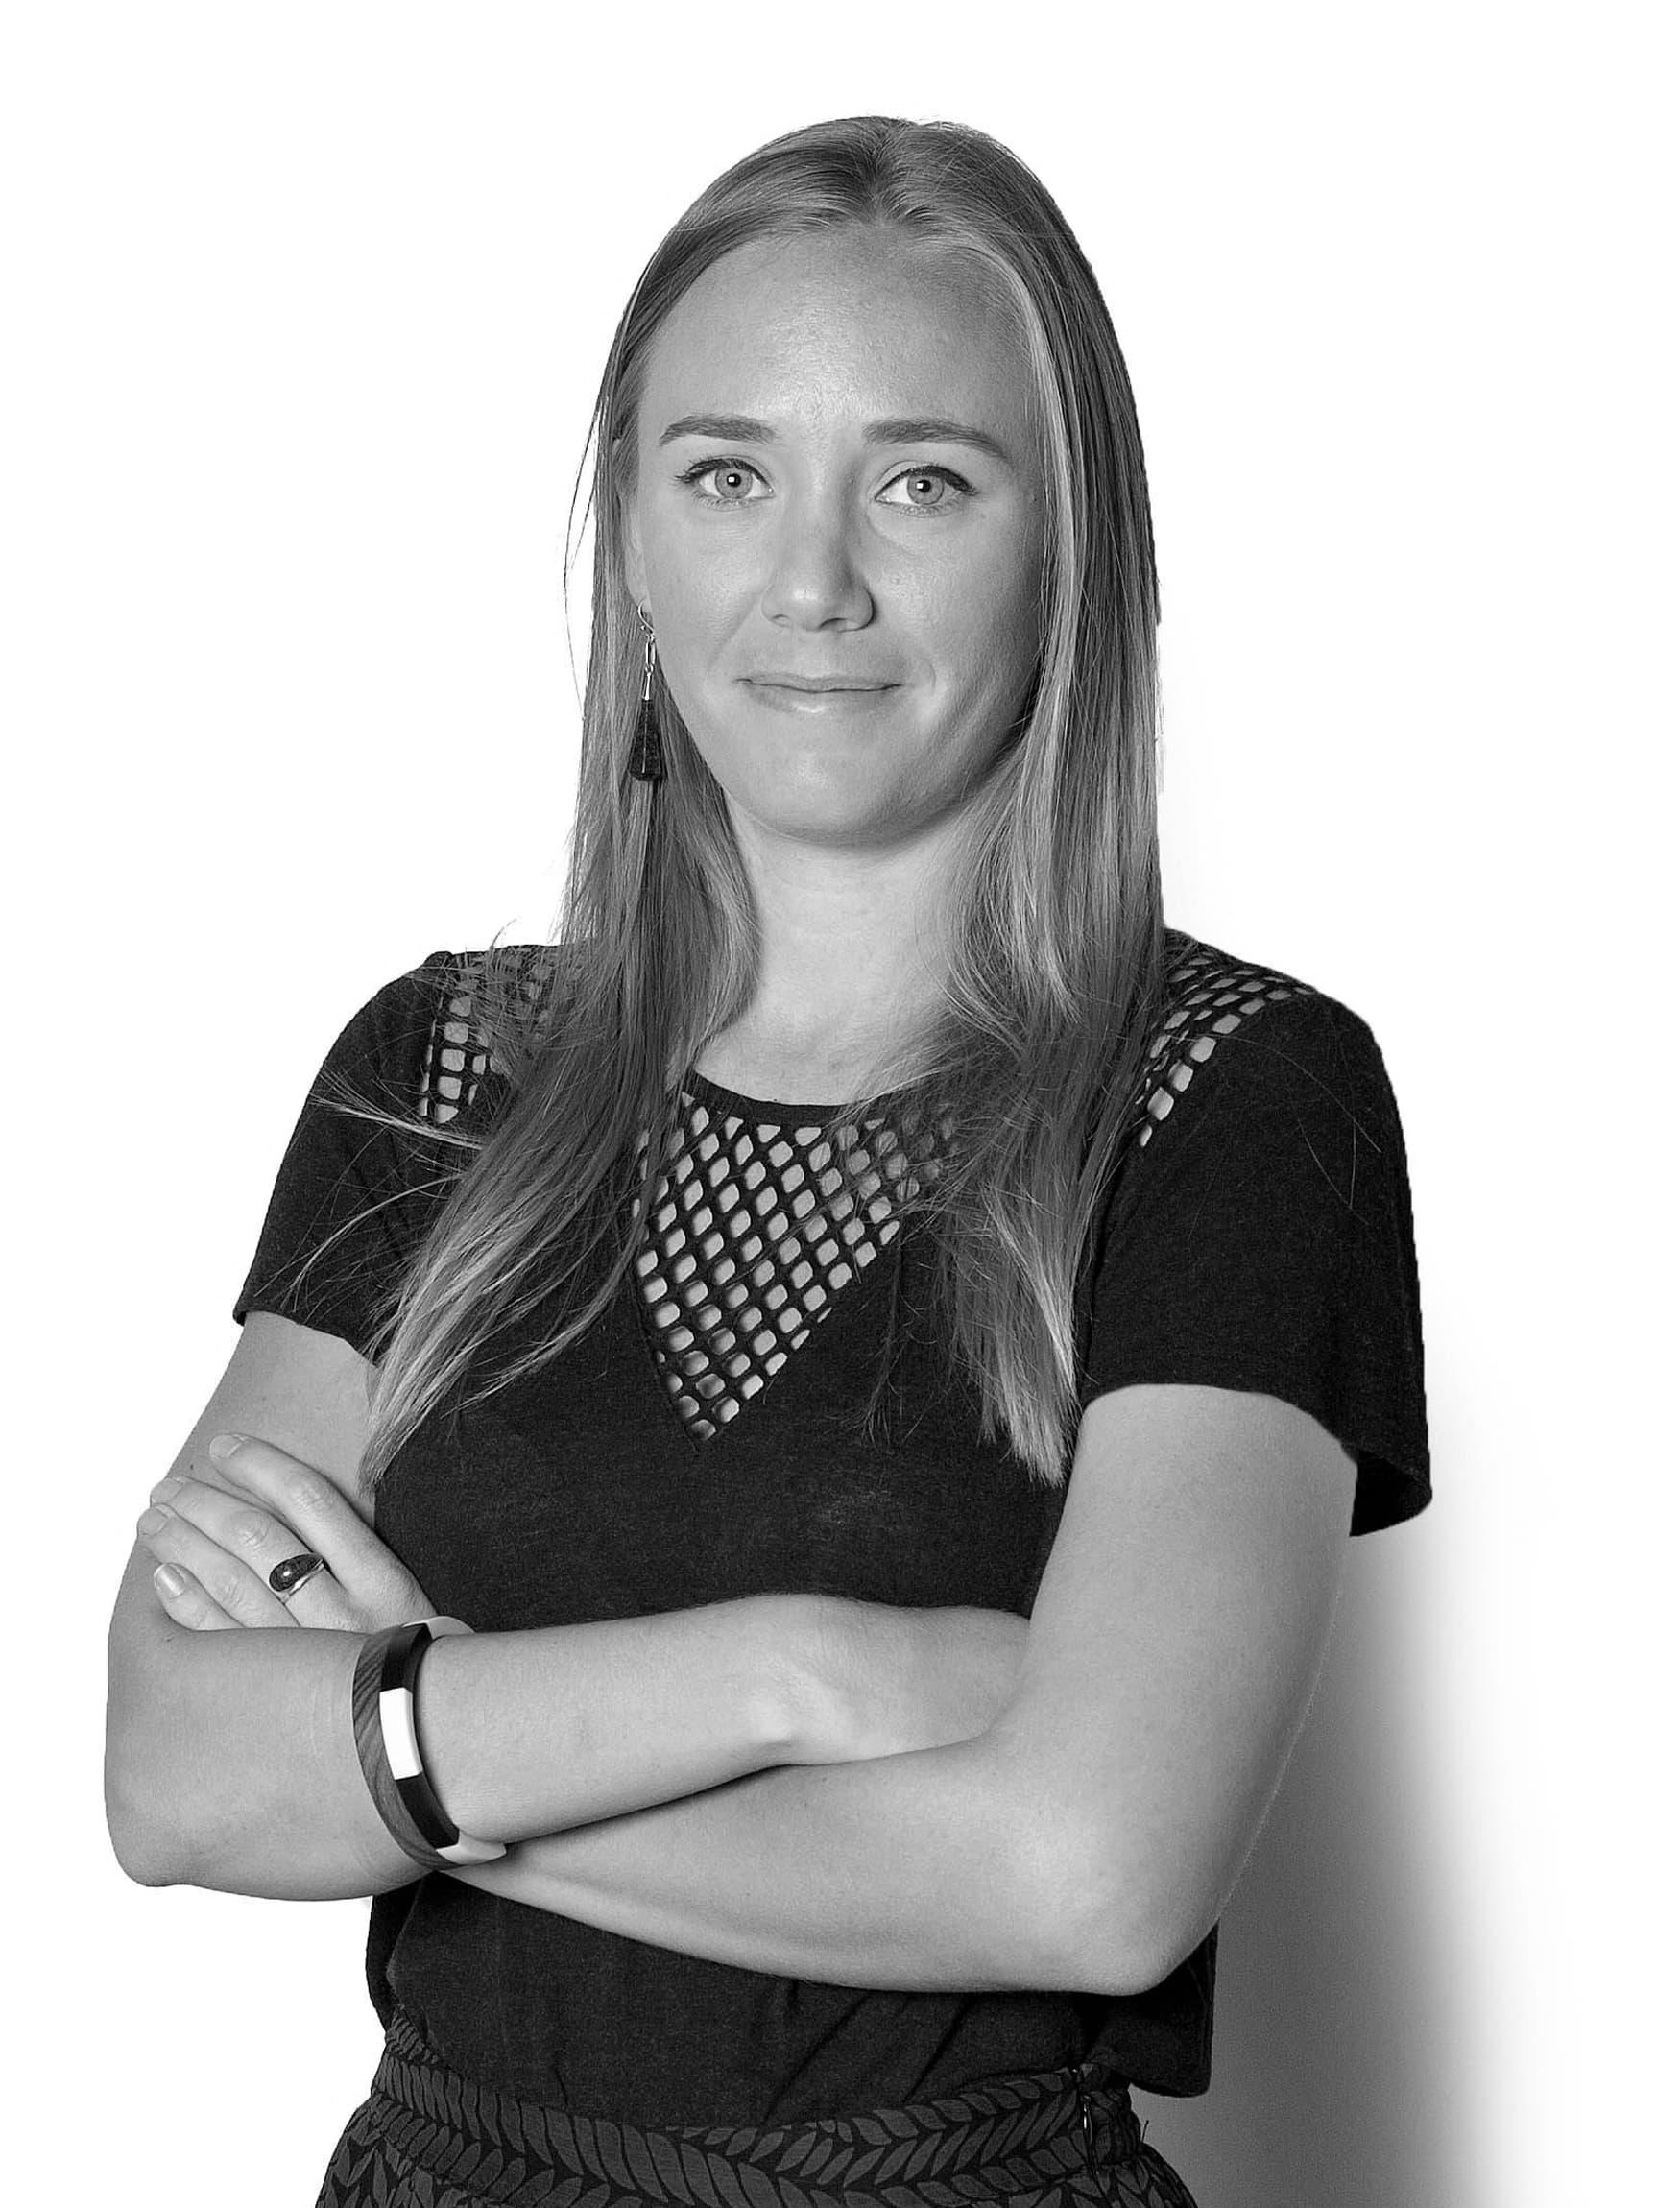 Stephanie Lessman employee of RSM Design in San Clemente, California.